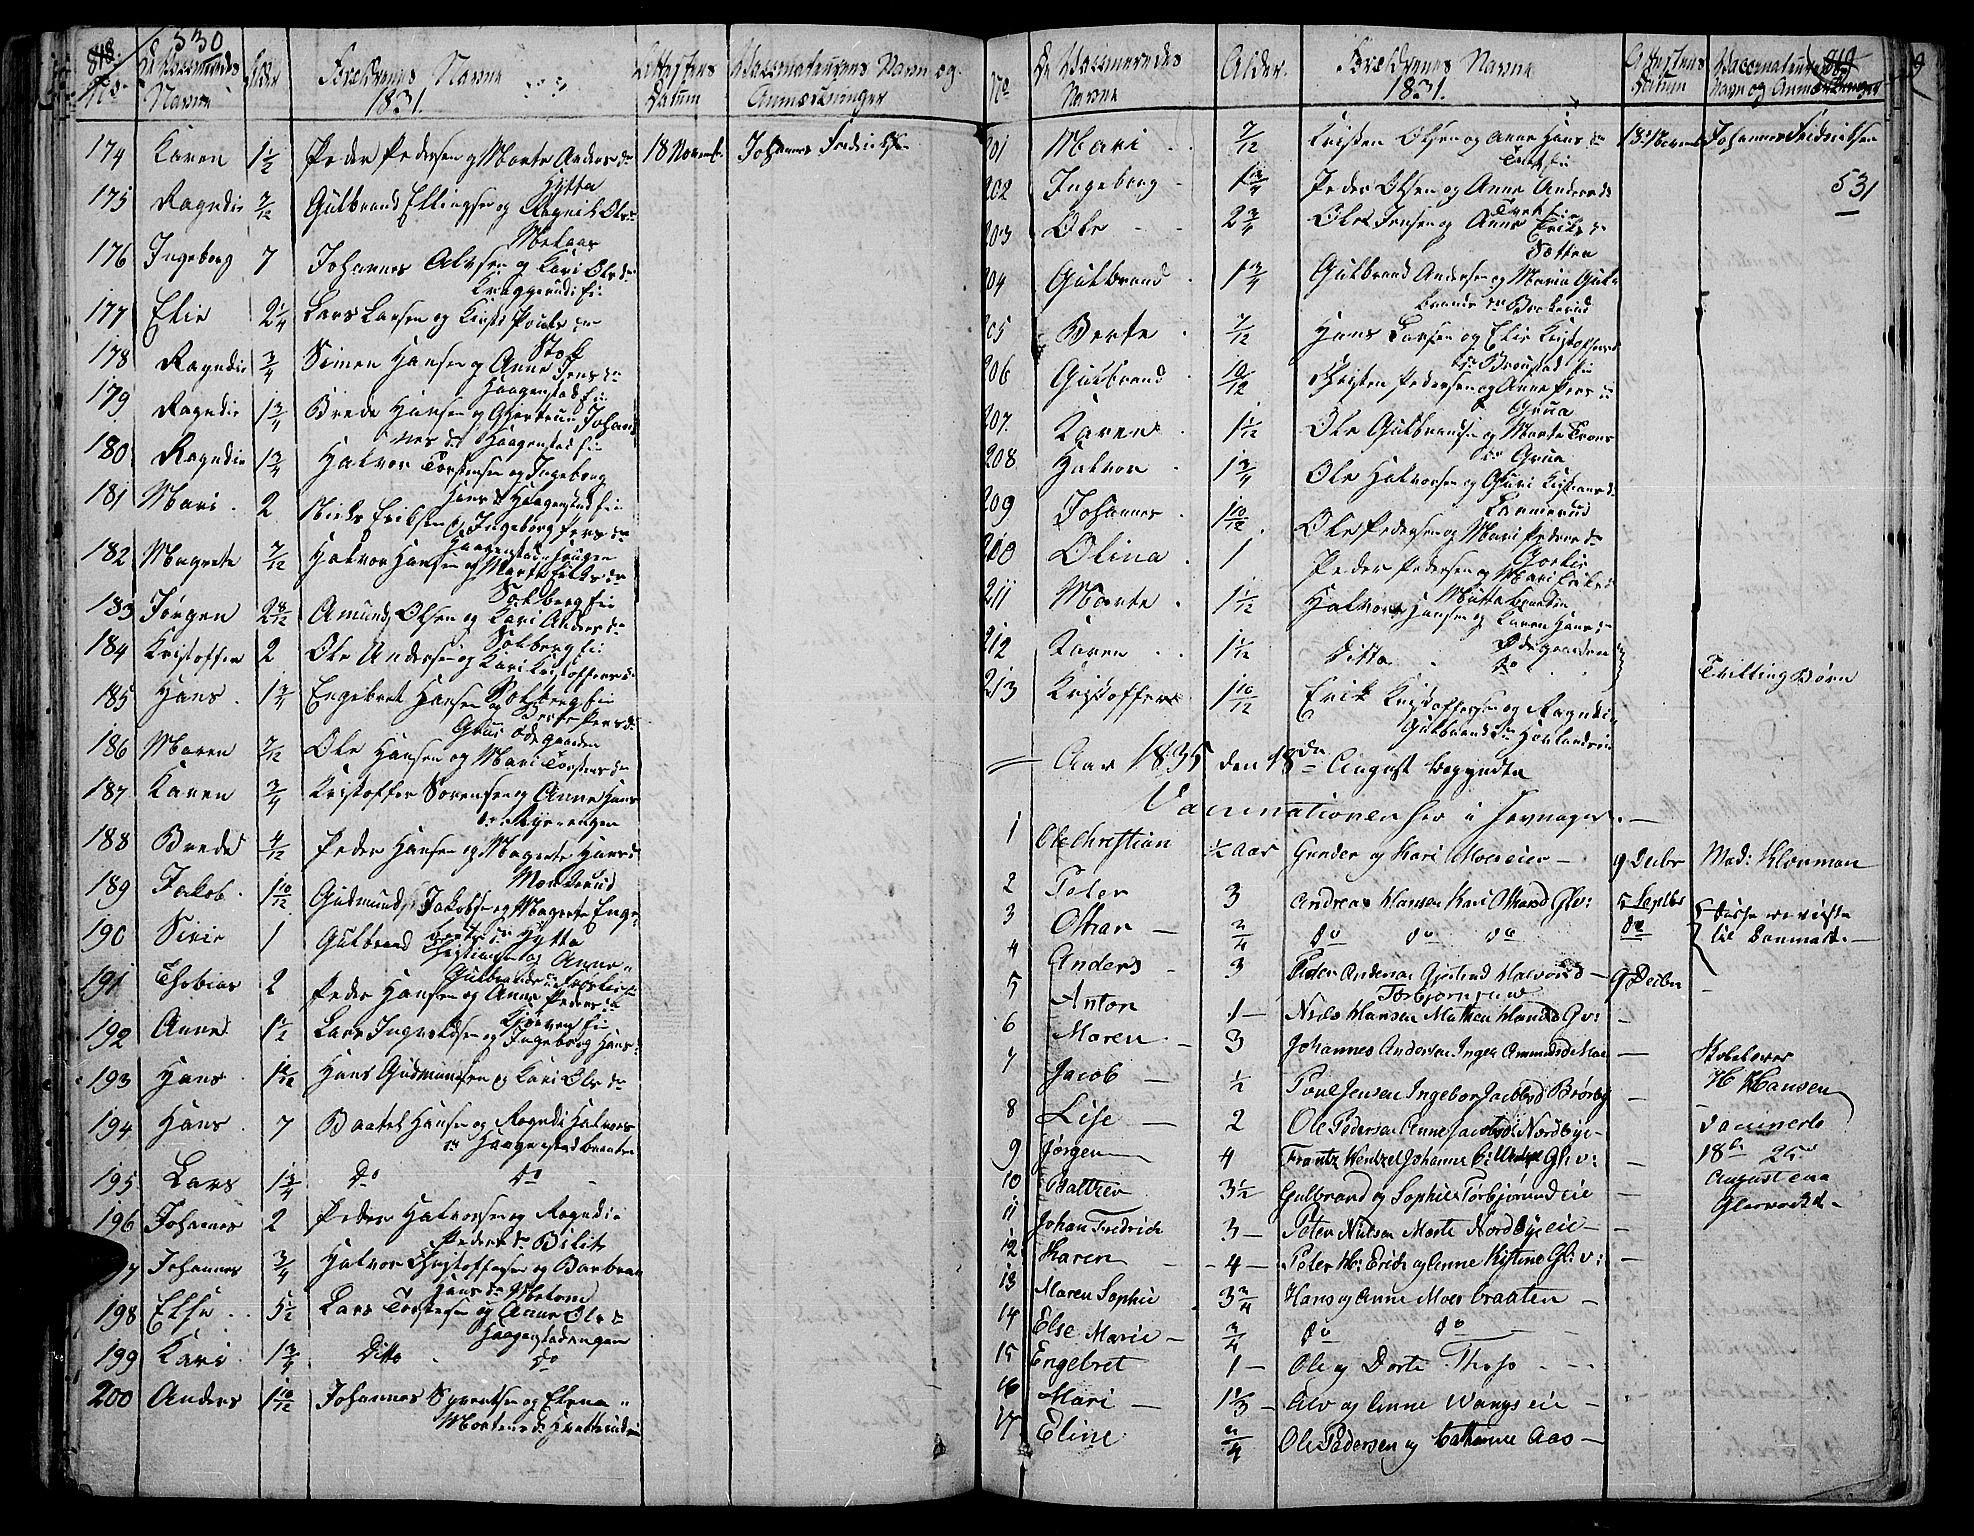 SAH, Jevnaker prestekontor, Ministerialbok nr. 4, 1800-1861, s. 530-531